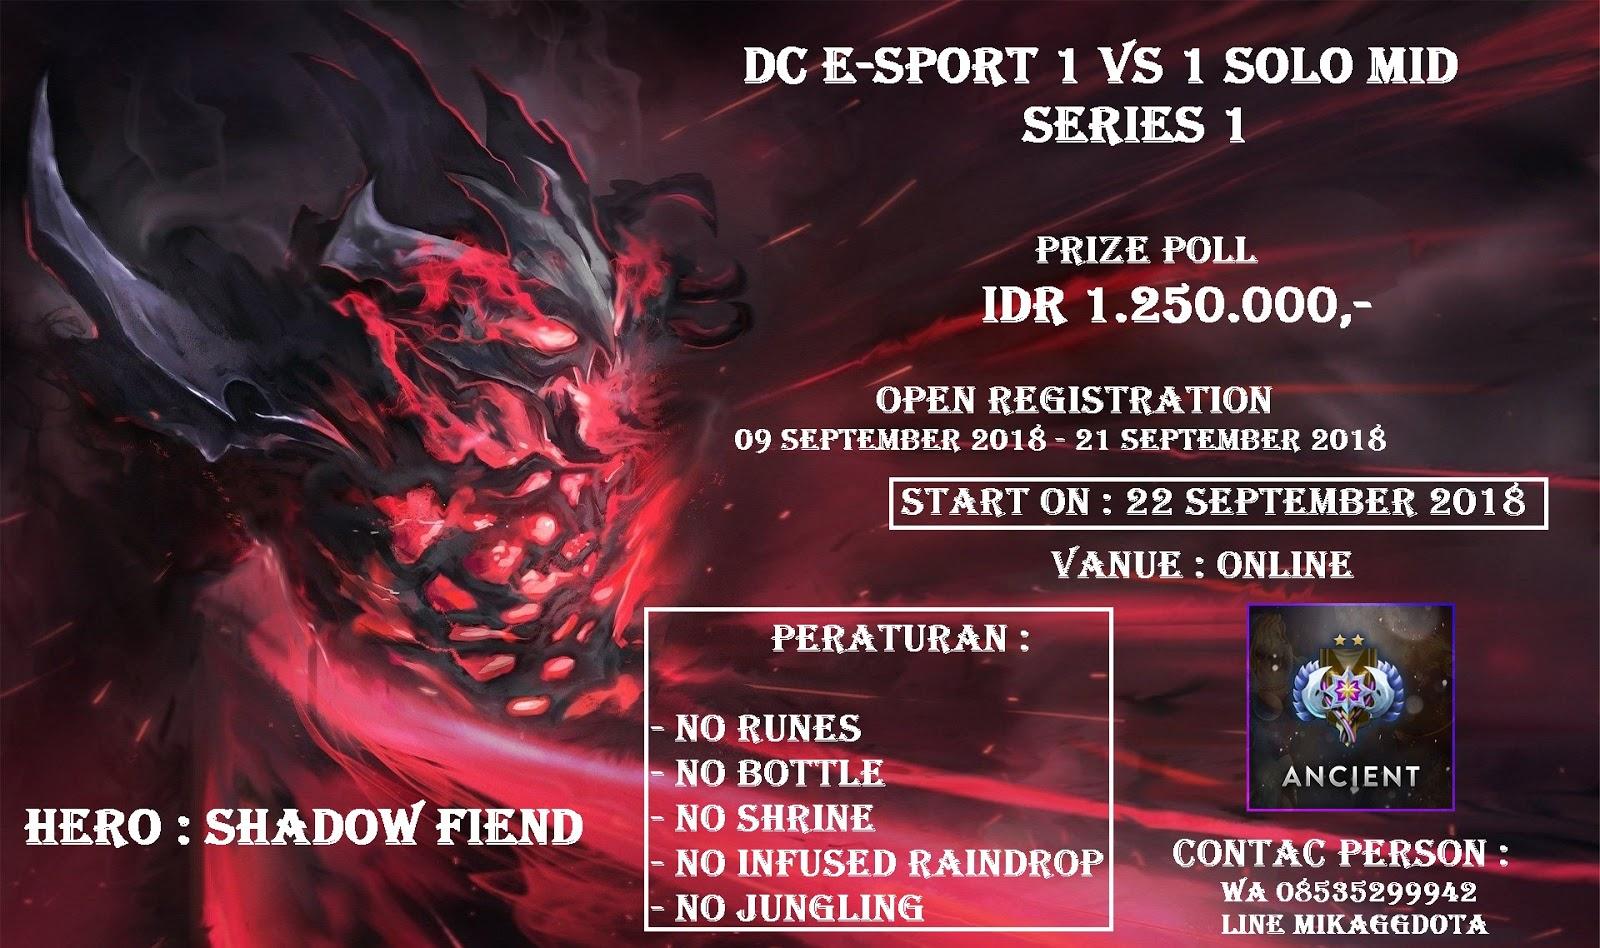 DC e-Sport 1 vs 1 Series 1 - Dota 2 Tournament Online